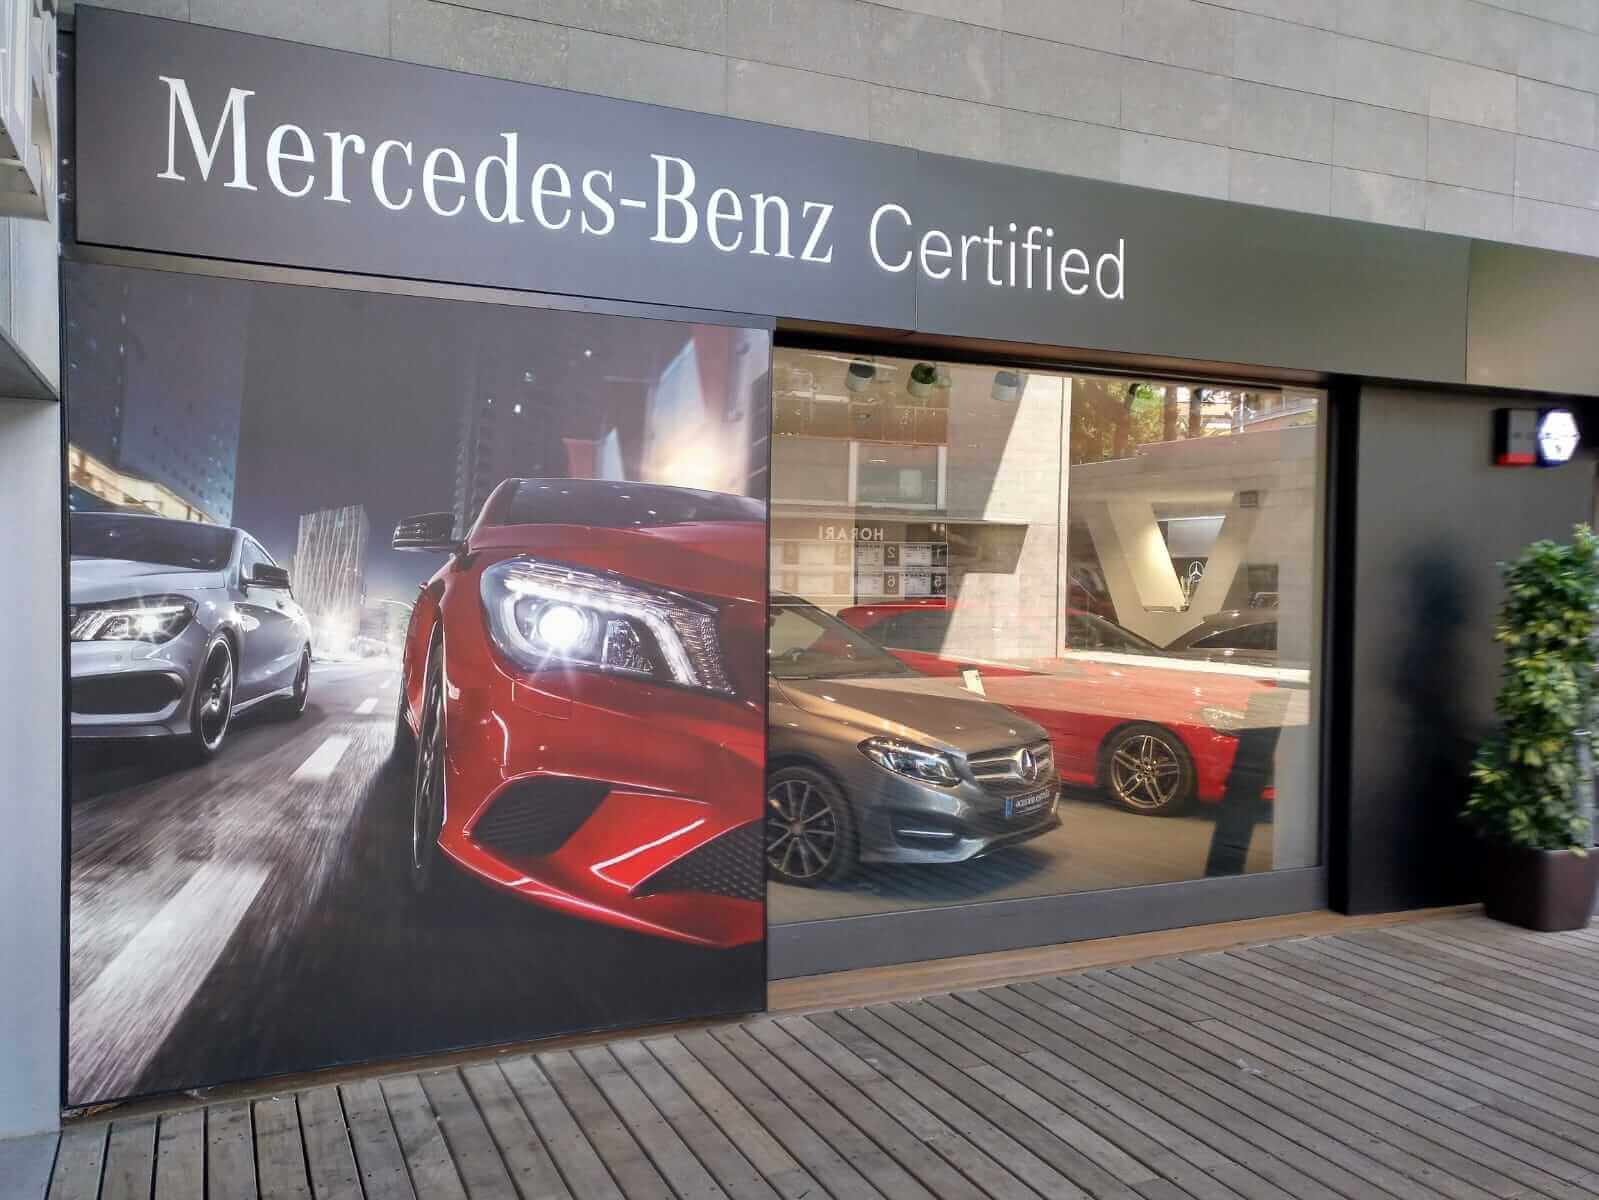 Autobeltran Mercedes-Benz Certified